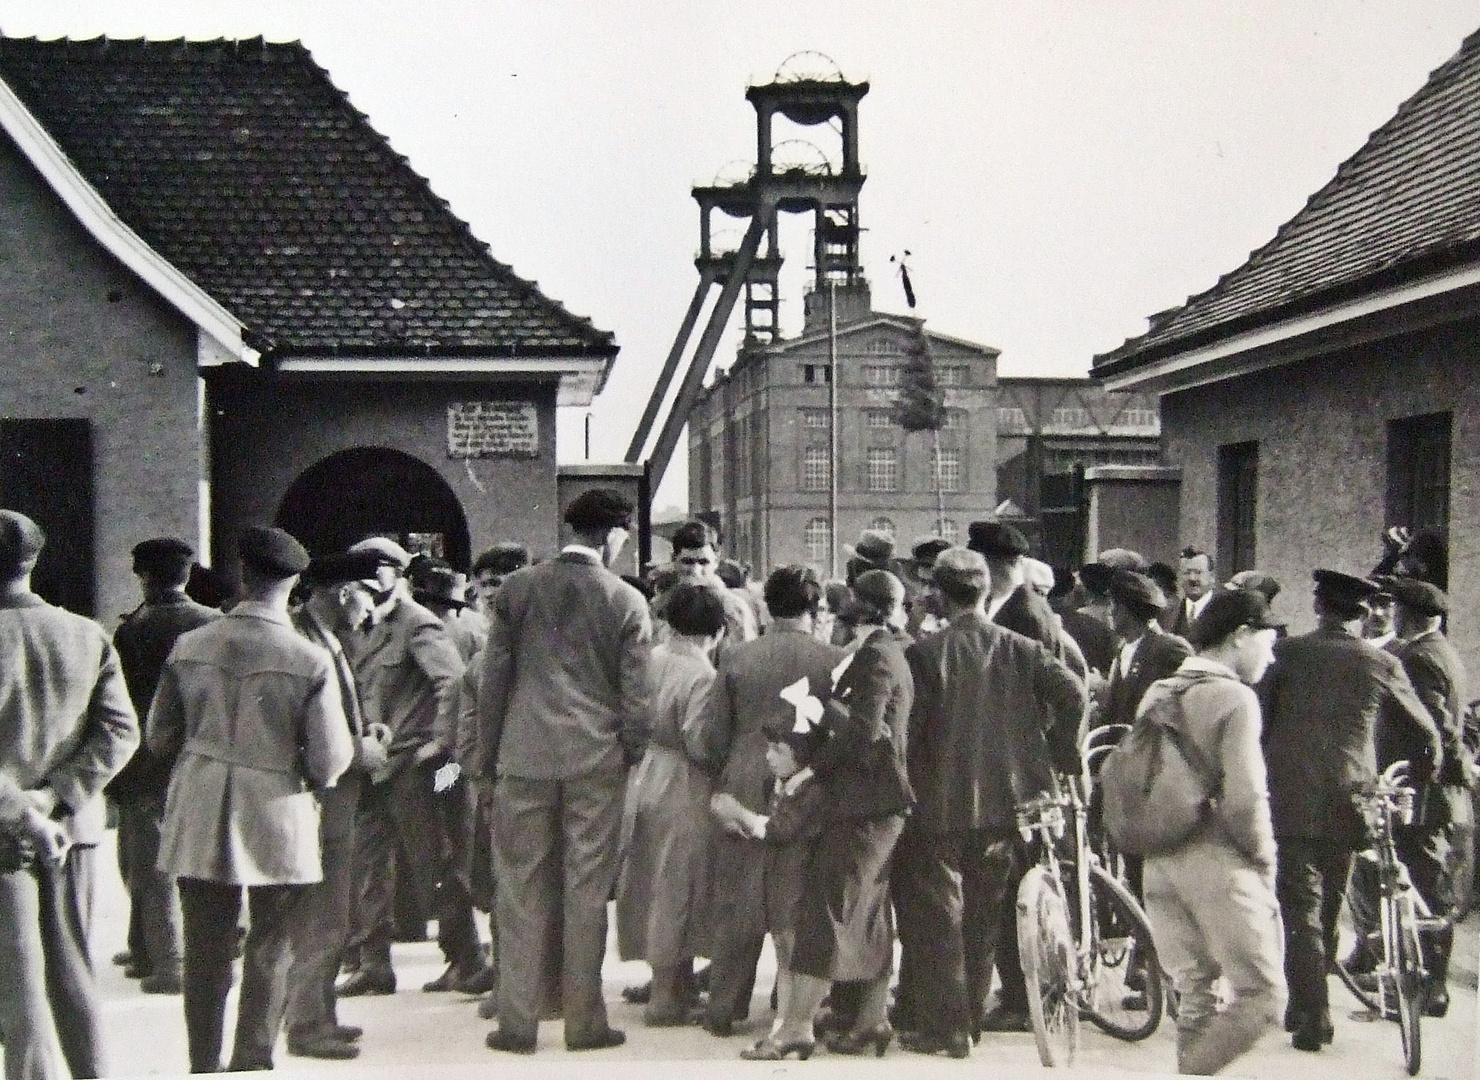 Bugginen, den 07. Mai 1934 kurz nach 10:00 Uhr